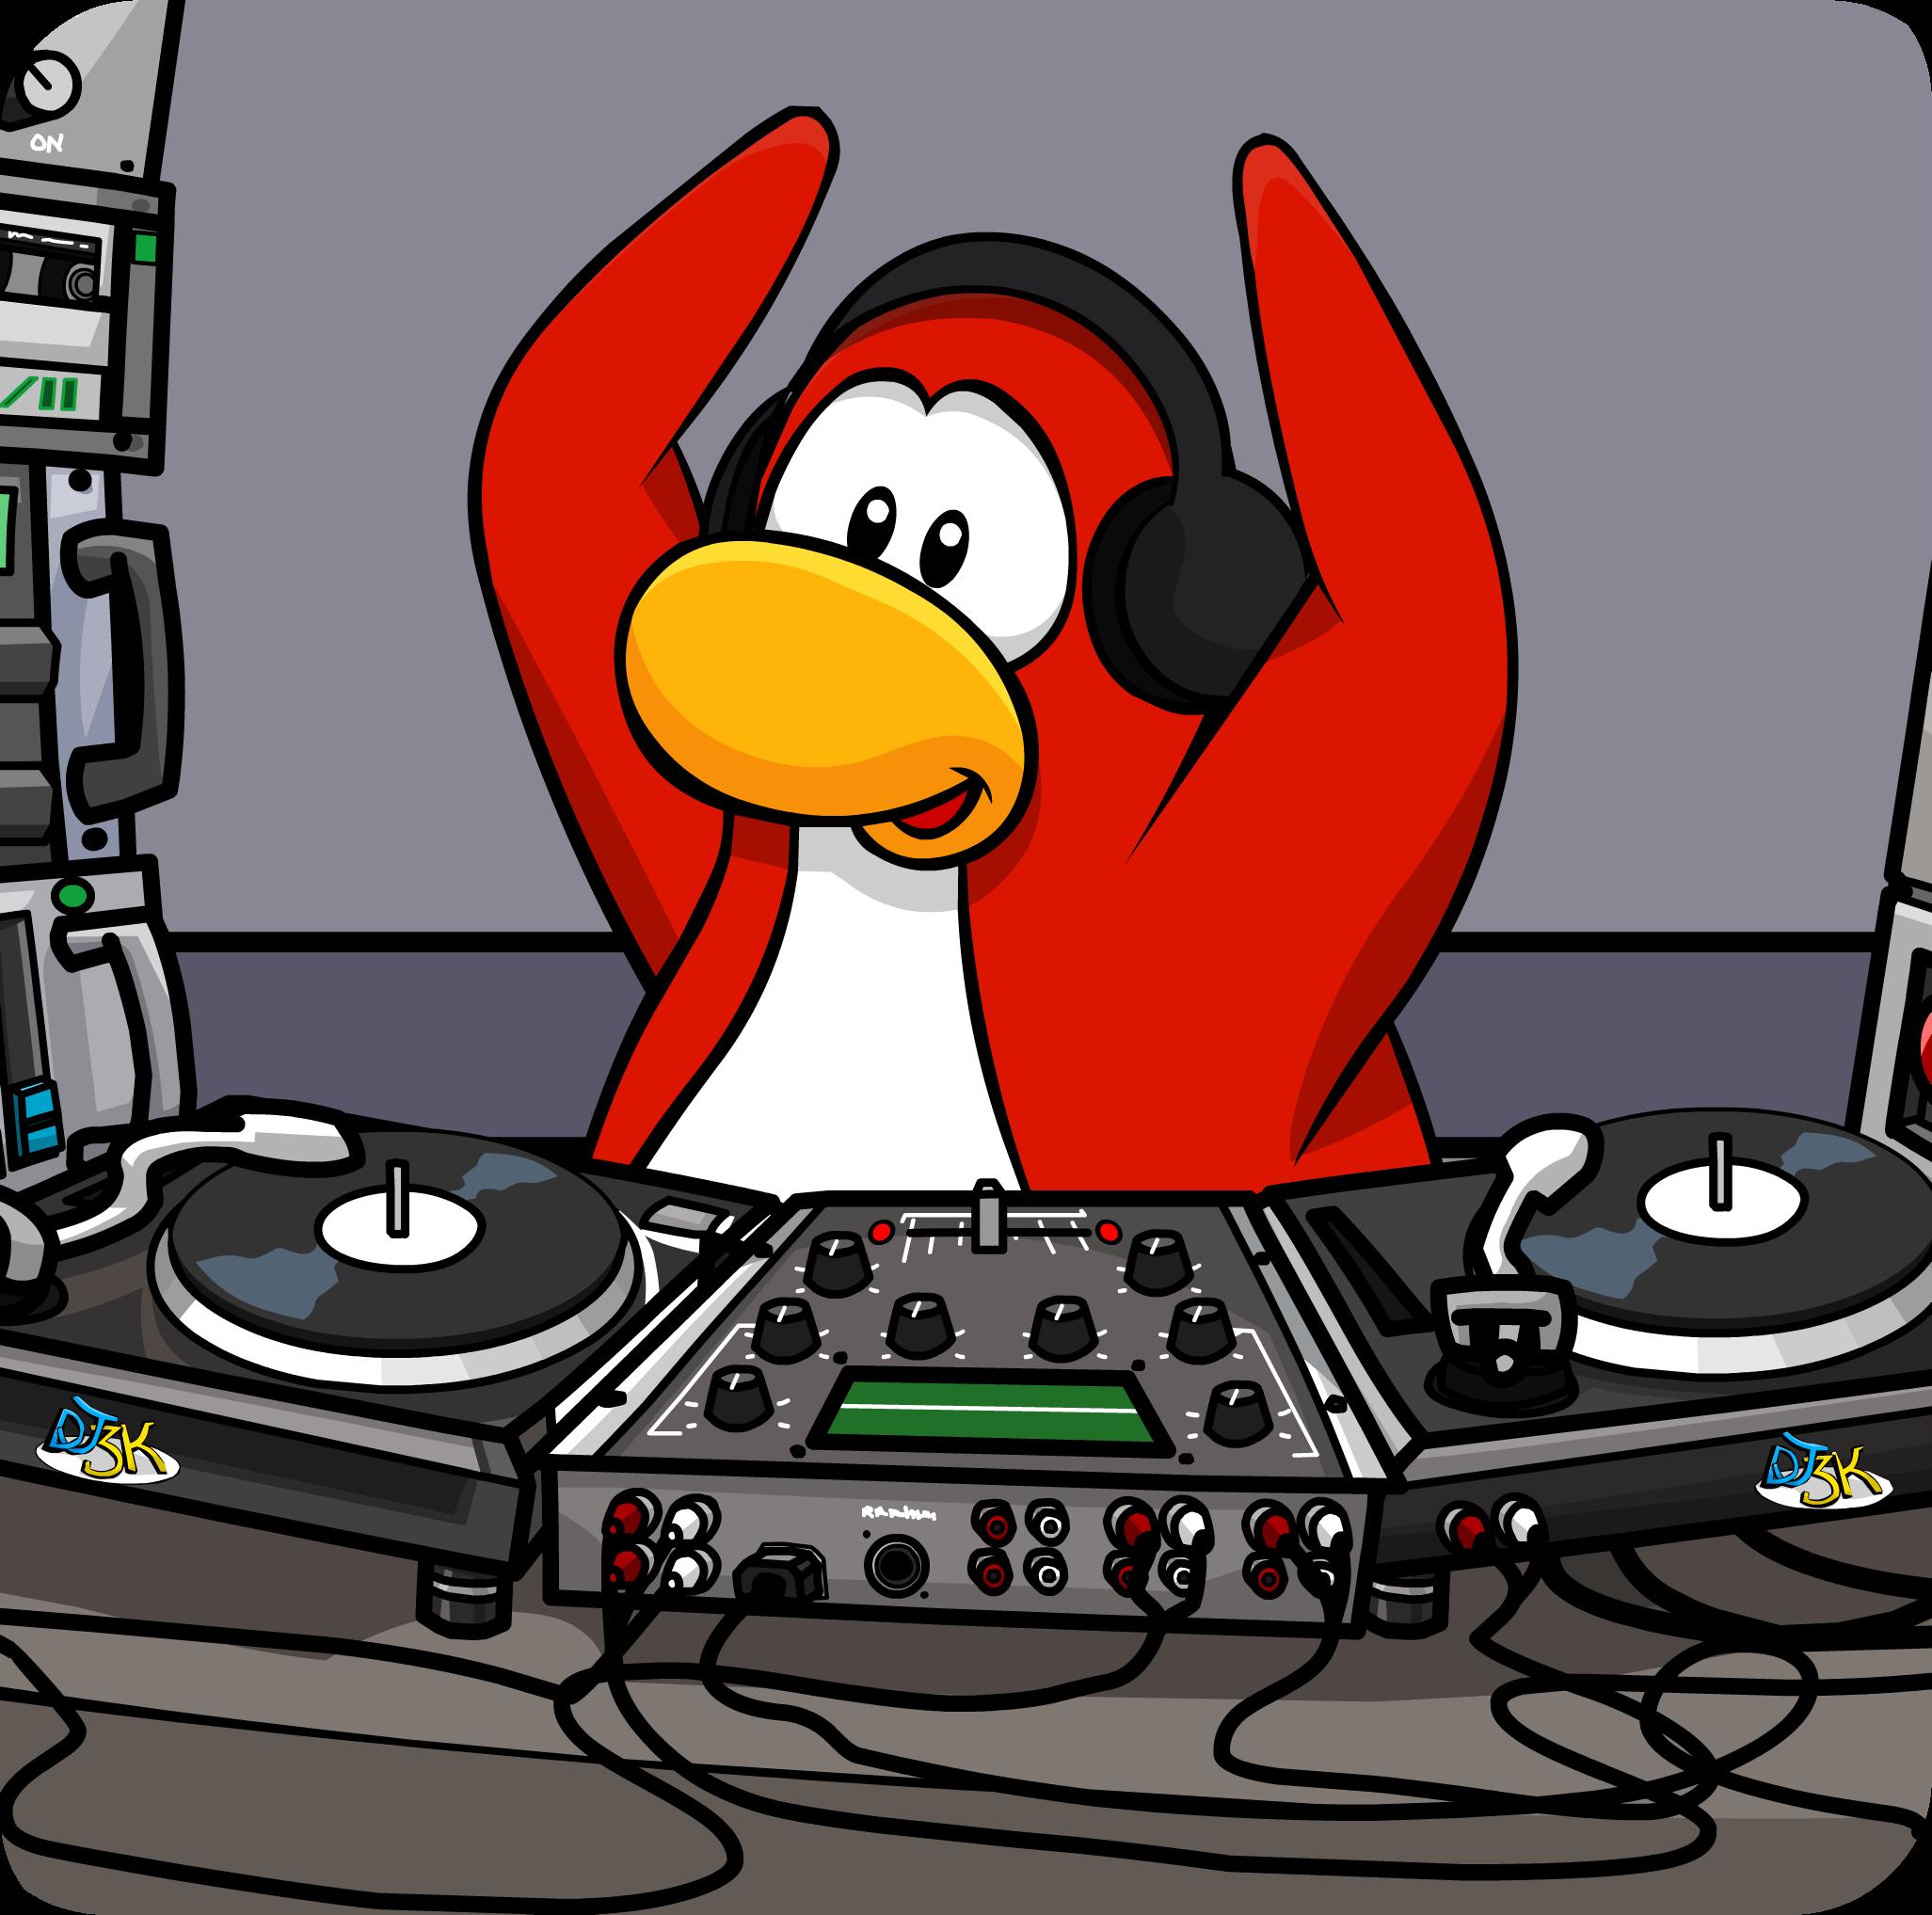 DJ Maxx's Headphones